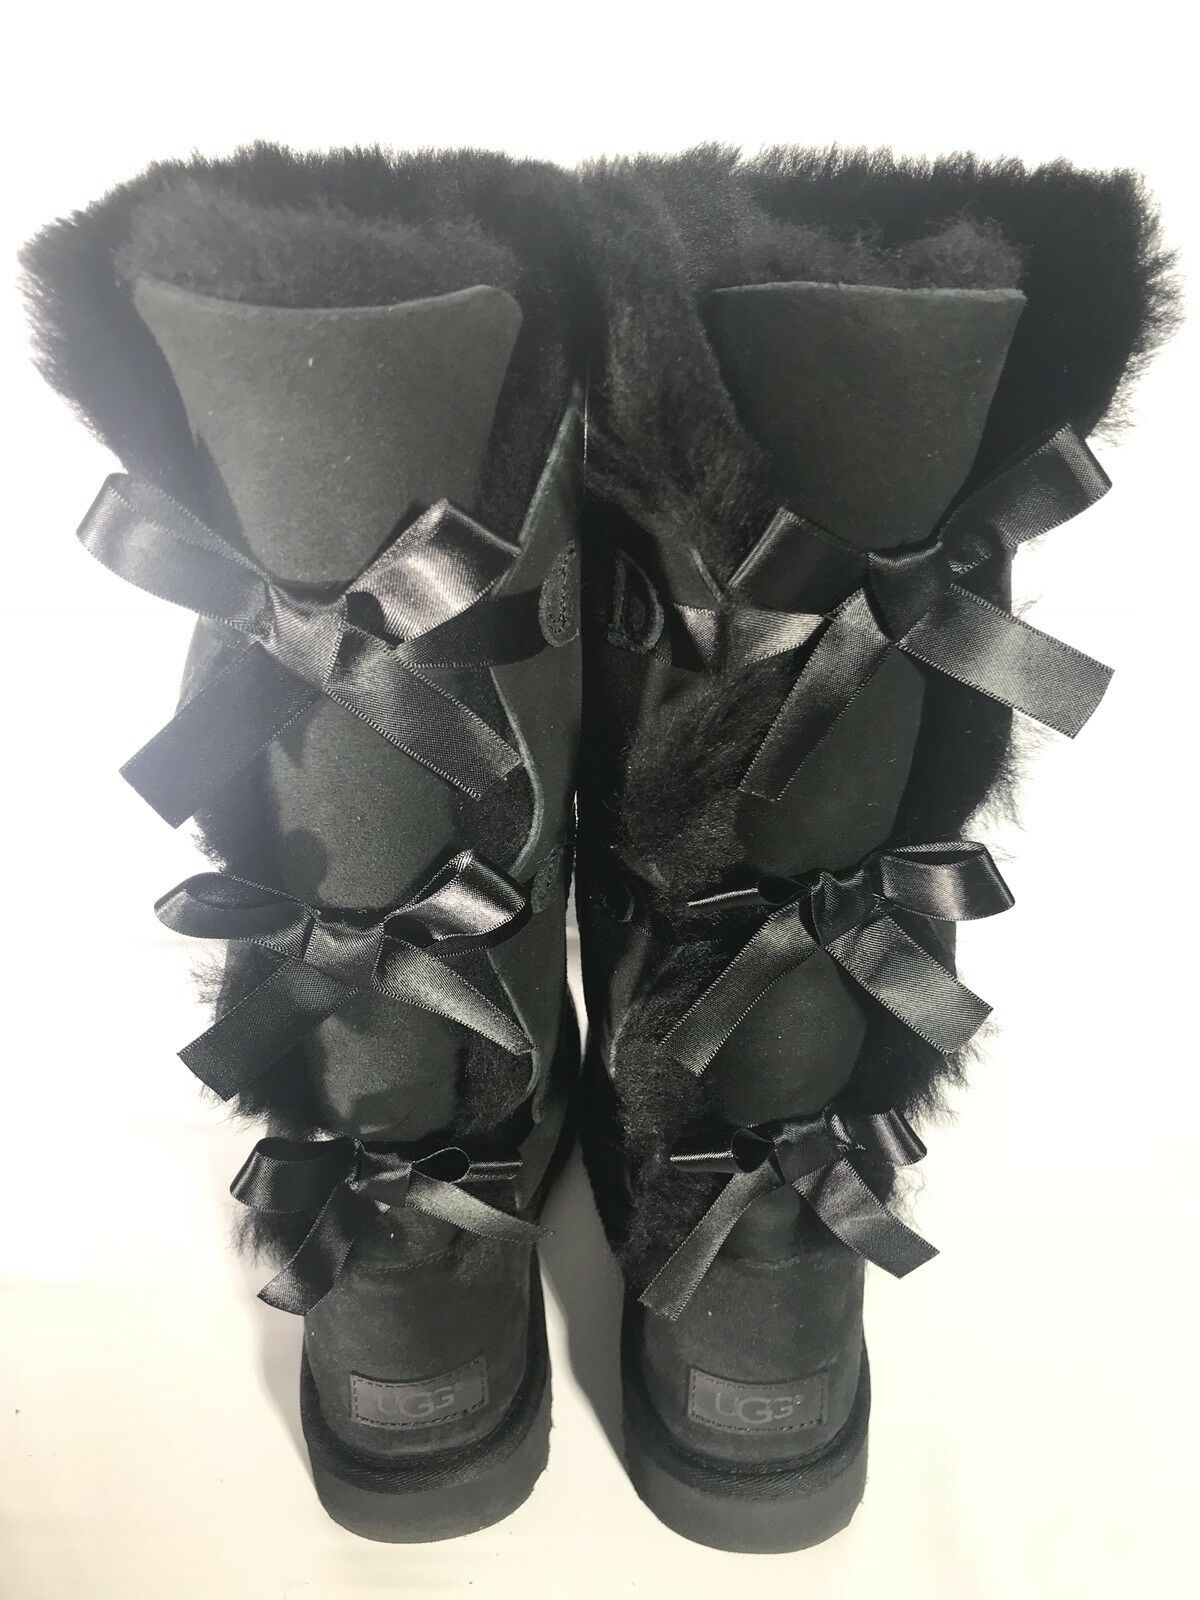 14a9d2896fc UGG Tall Triple Triplet Bailey Bow Black Suede Sheepskin Boots Size 9 US  Women